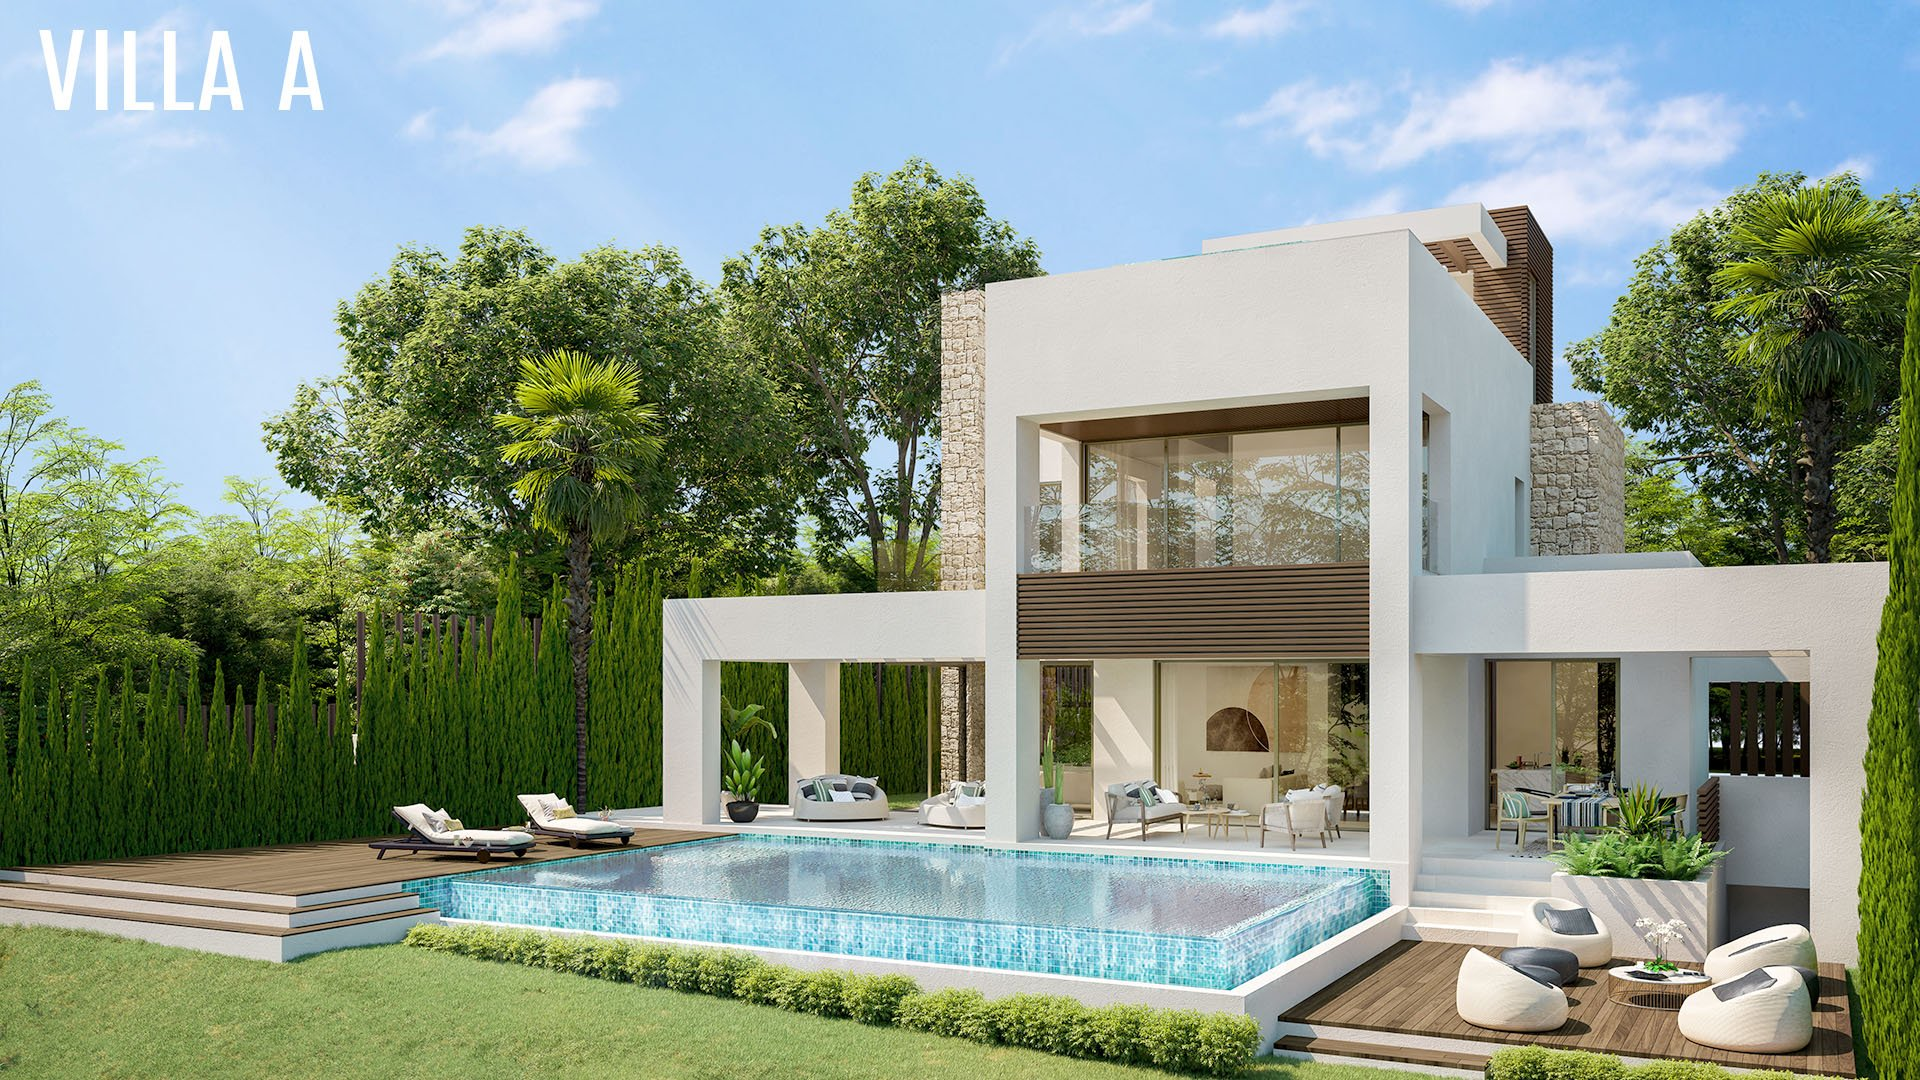 La Fuente: Villas in a unique location on the Golden Mile in Marbella